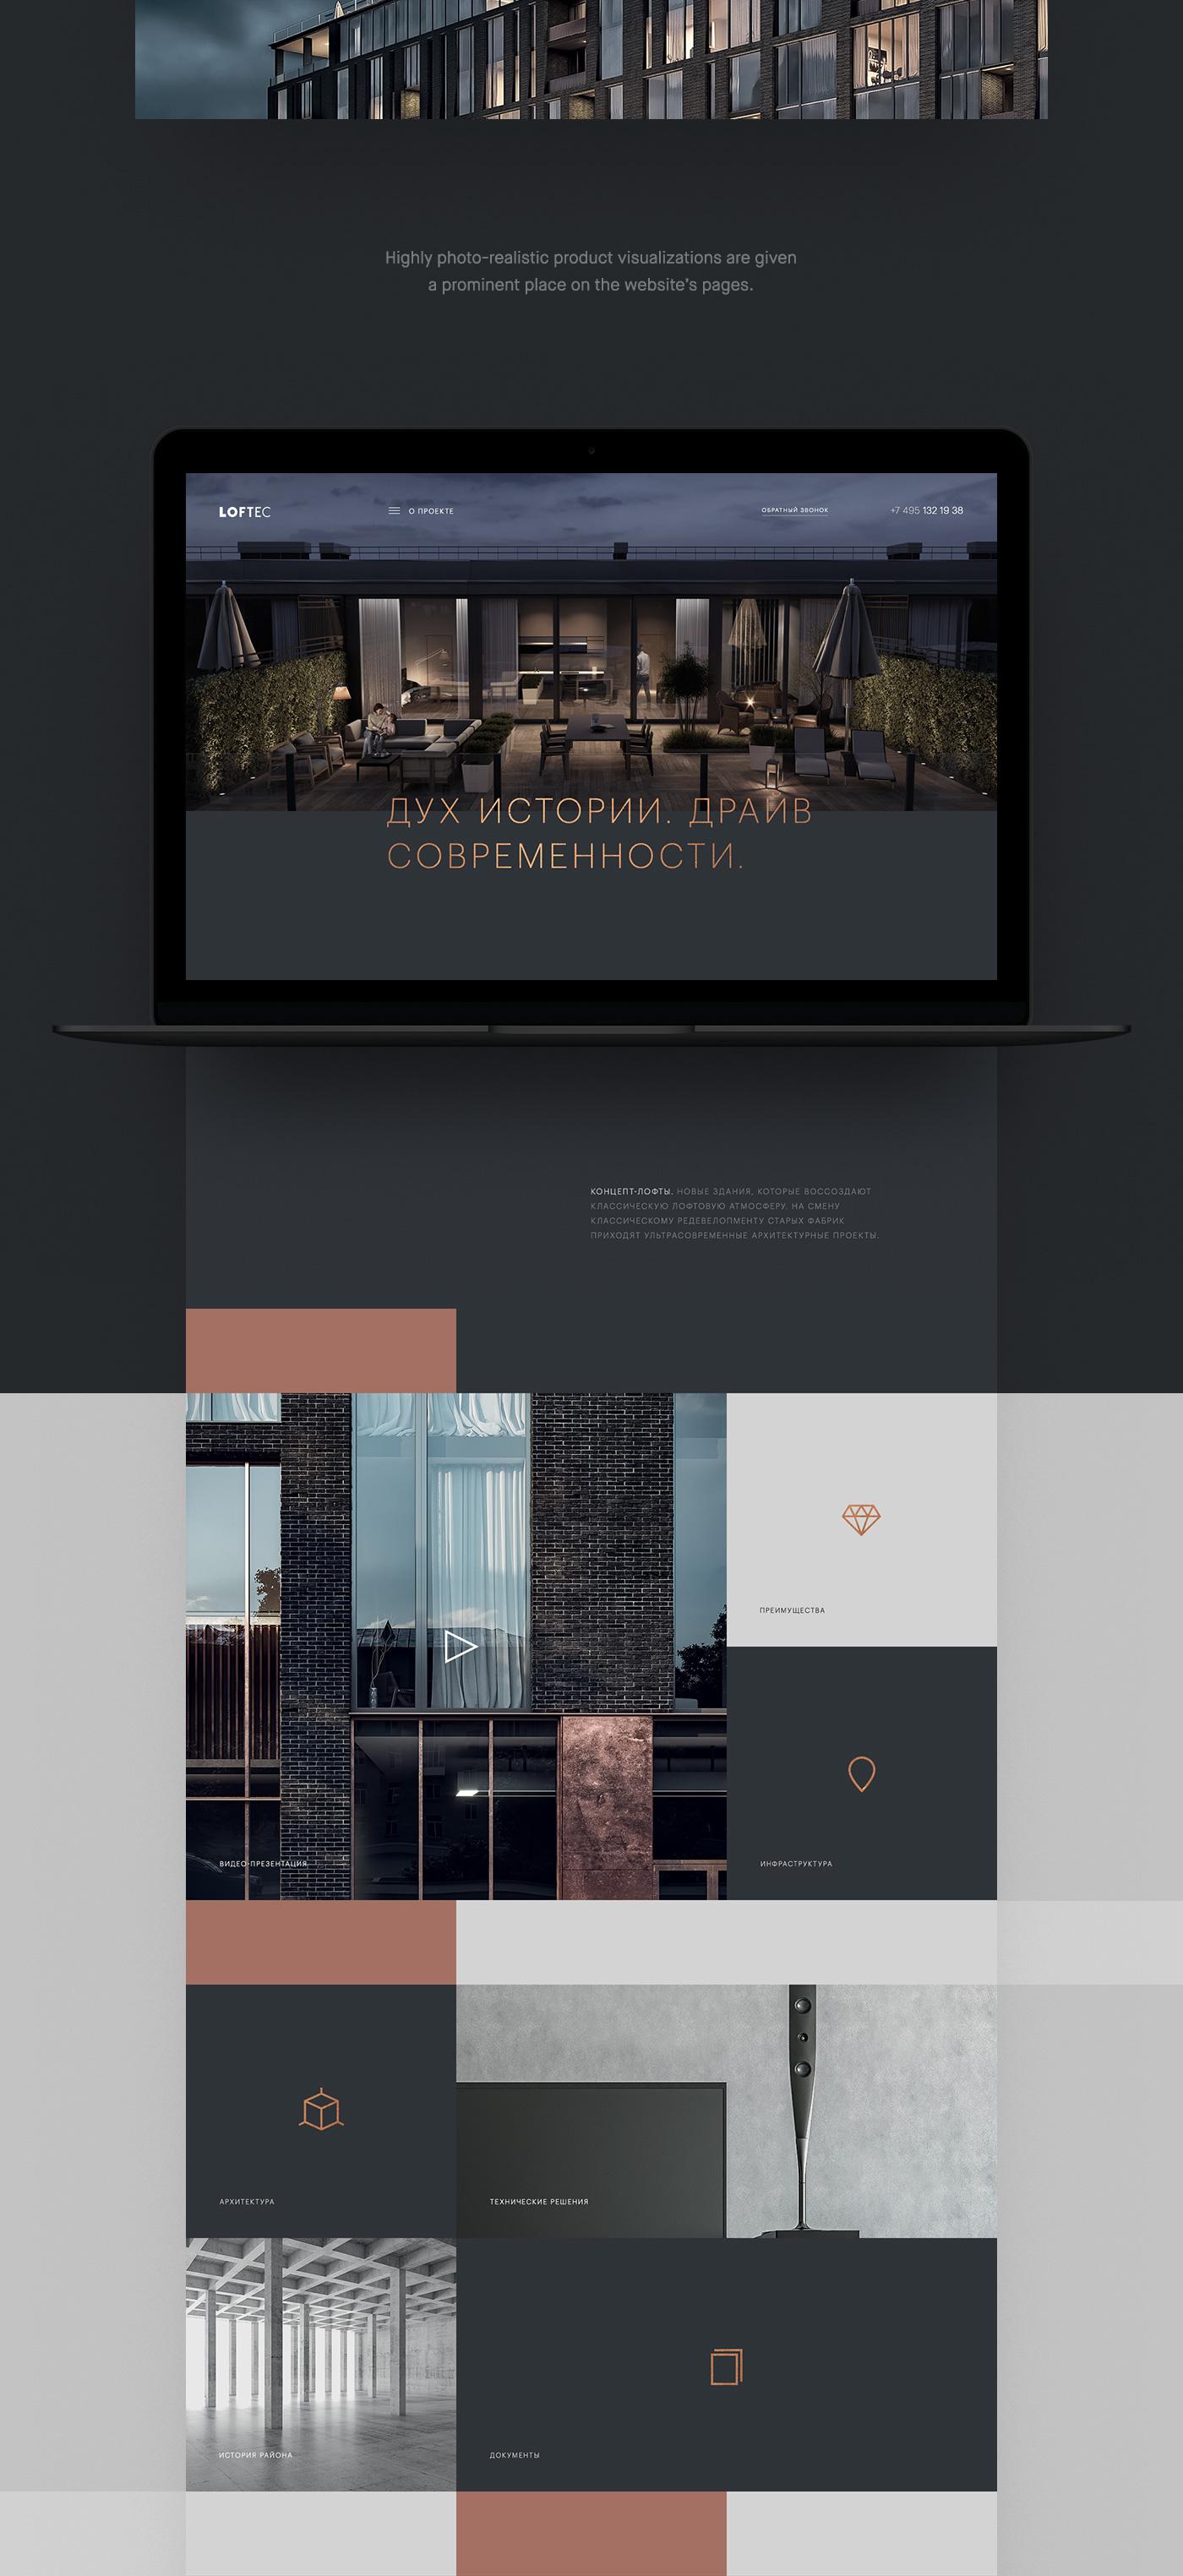 loftec,realty,estate,luxury,vide infra,property,architecture,dark,gold